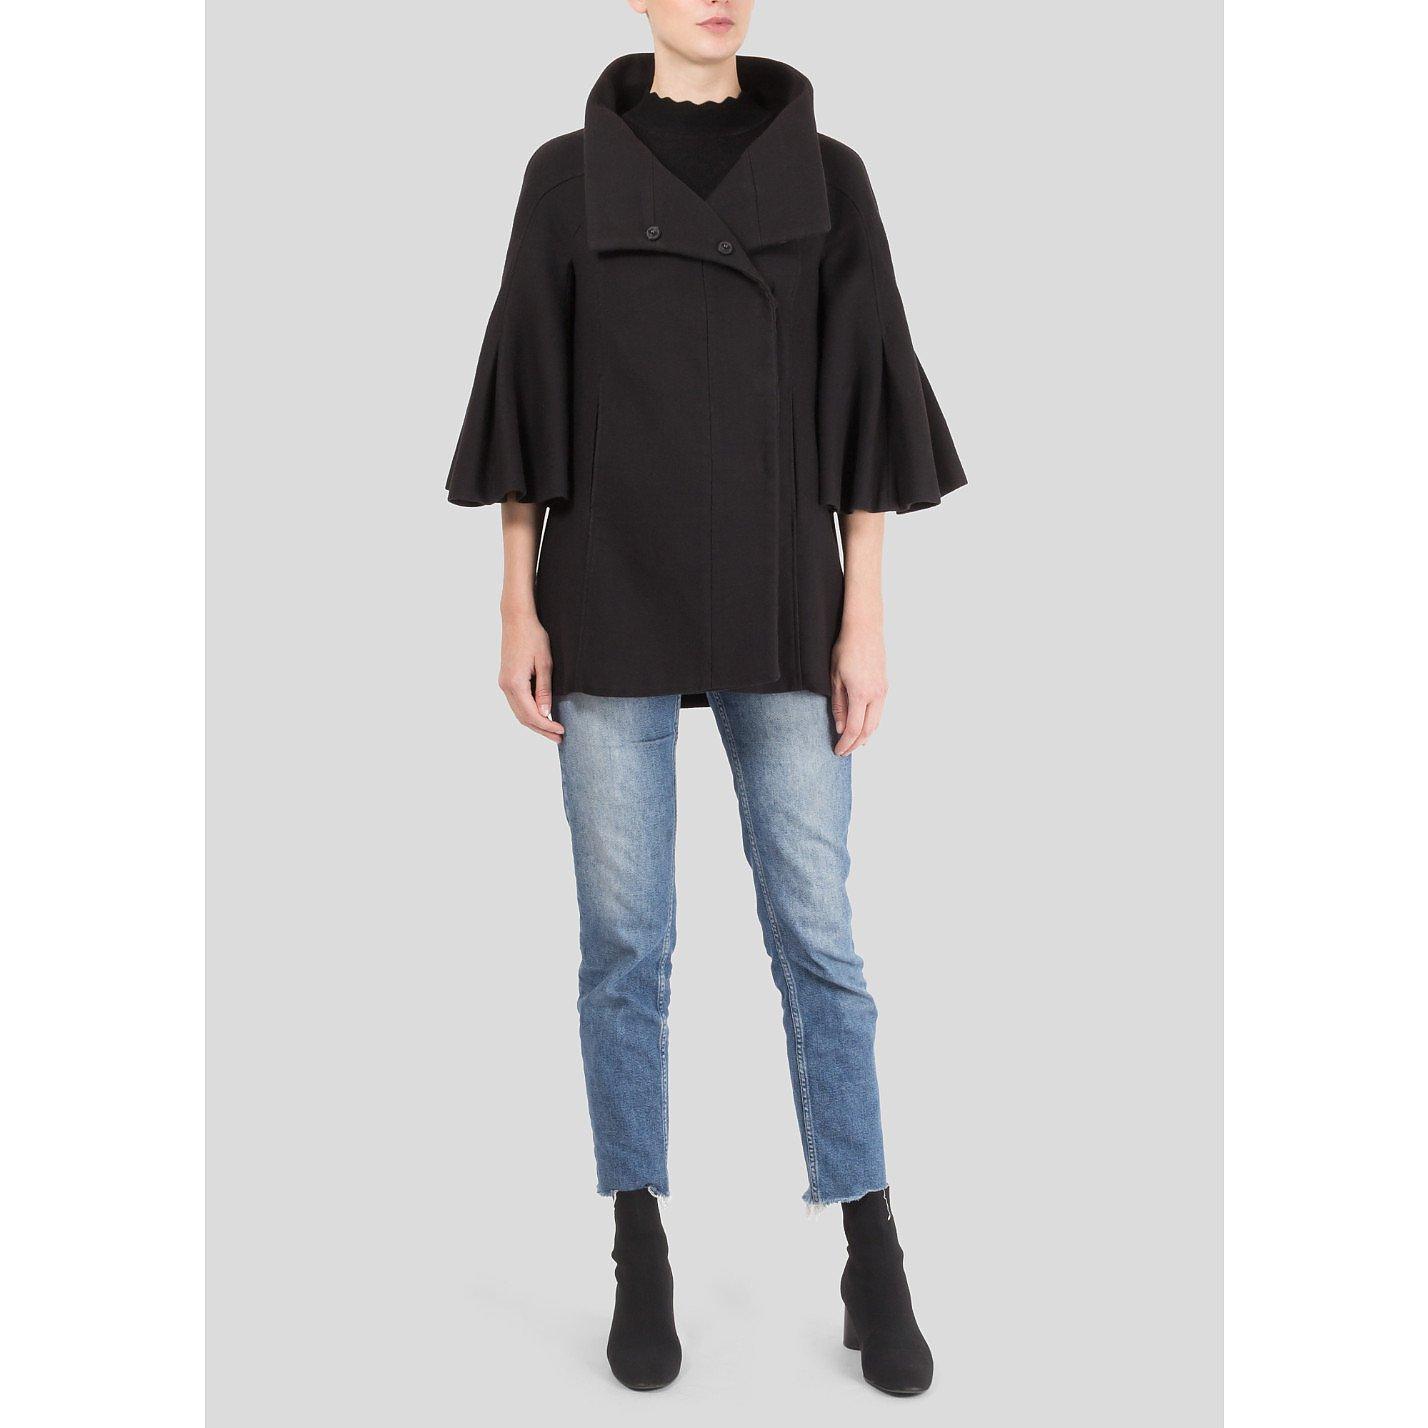 Vanessa Bruno Cape Style Jacket